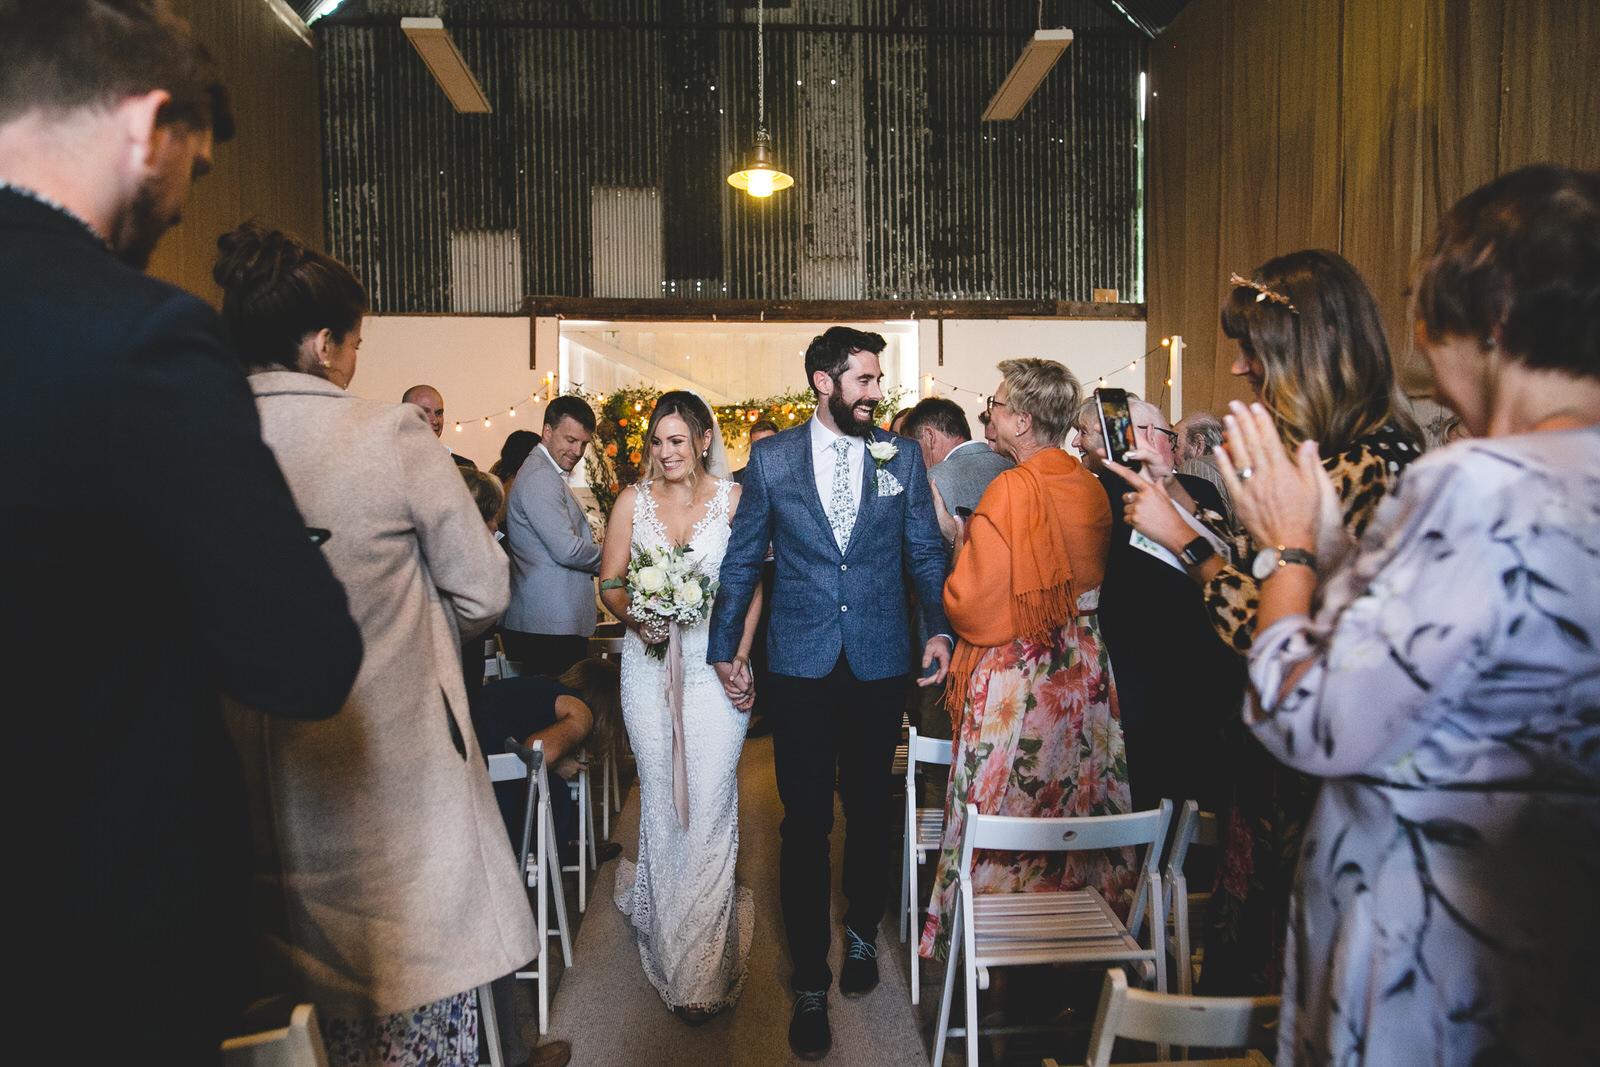 walking down the aisle at Cloughjordan House Wedding Venue